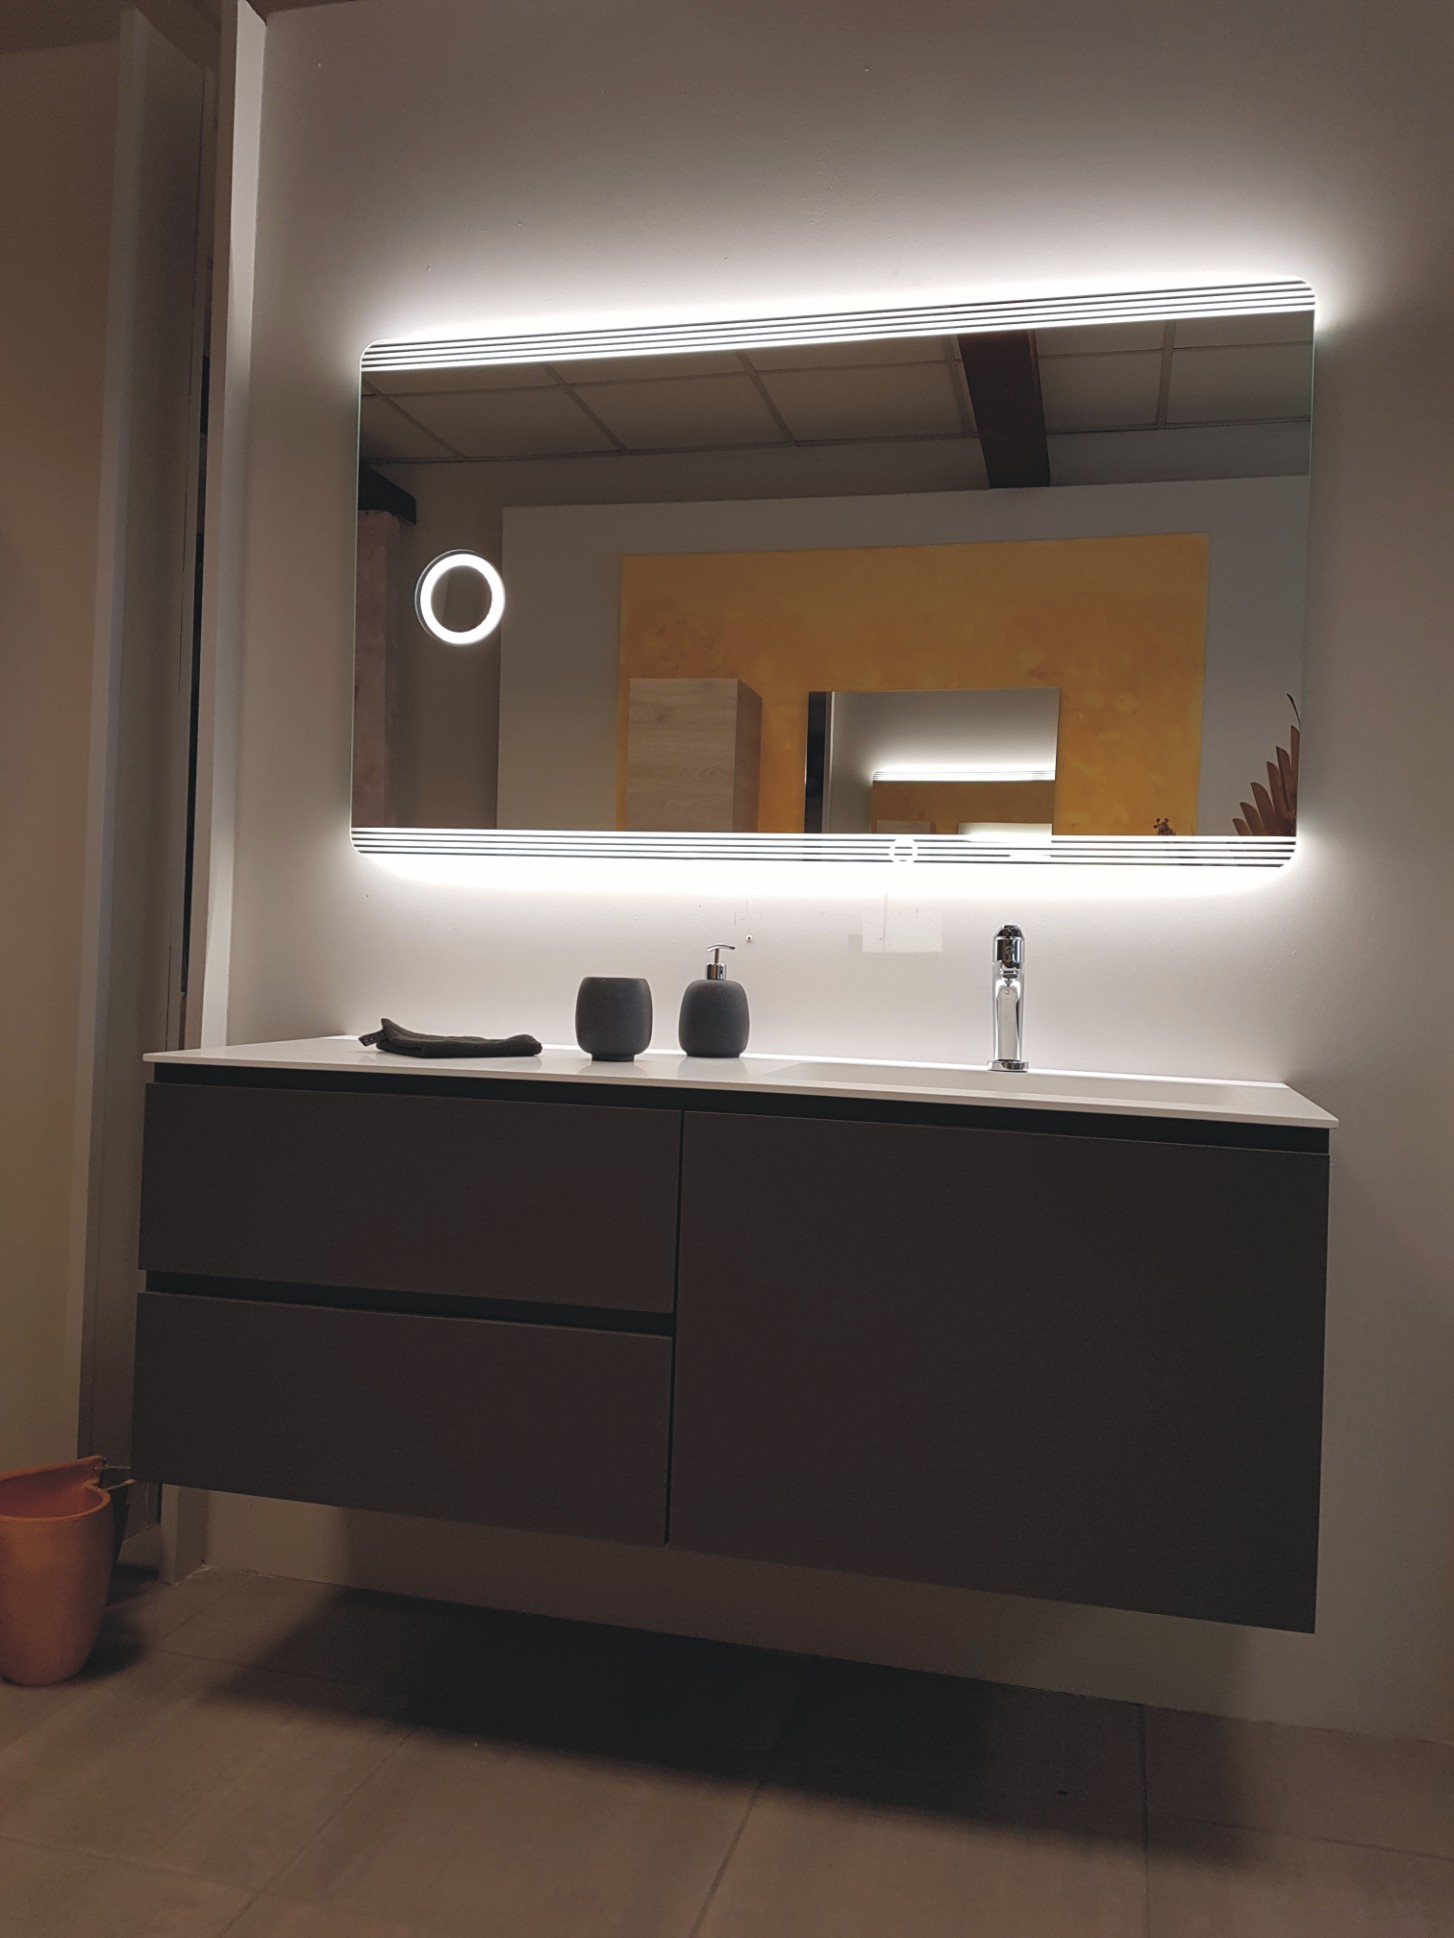 Offerta mobile bagno antracite outlet del bagno - Offerta mobile bagno ...